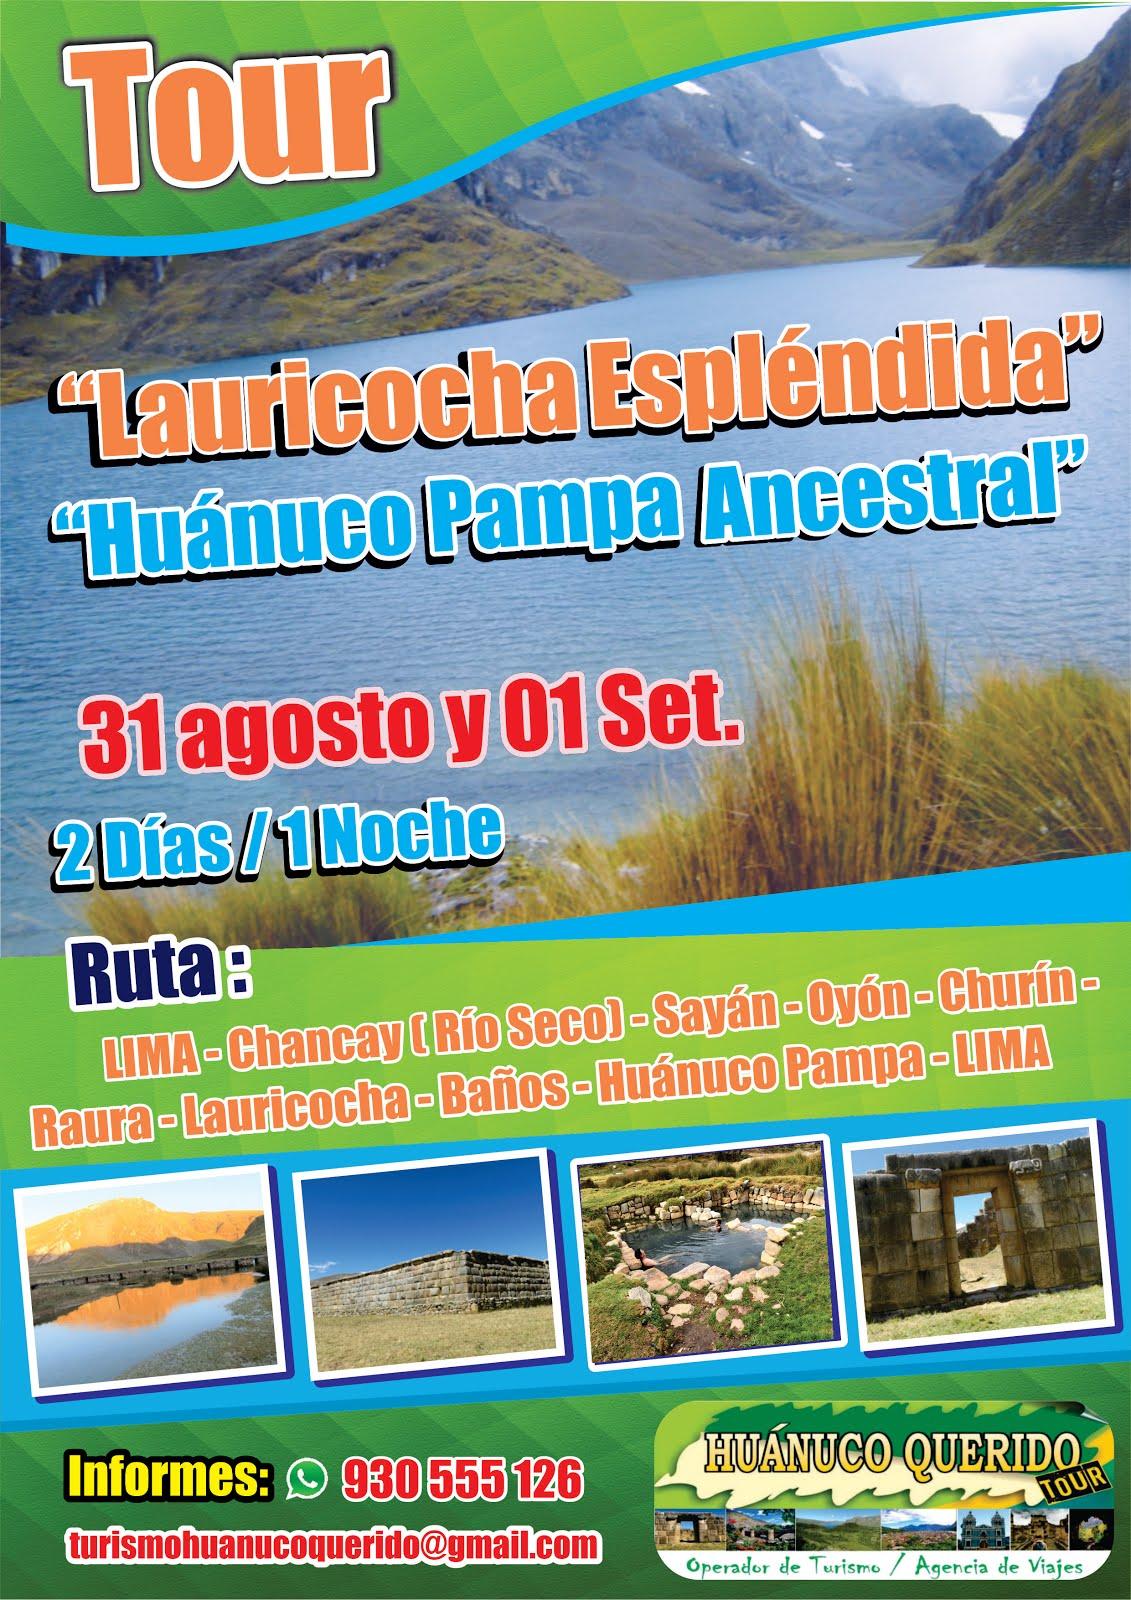 SEGUNDO TOUR: LAURICOCHA ESPLÉNDIDA / HUÁNUCO PAMPA ANCESTRAL